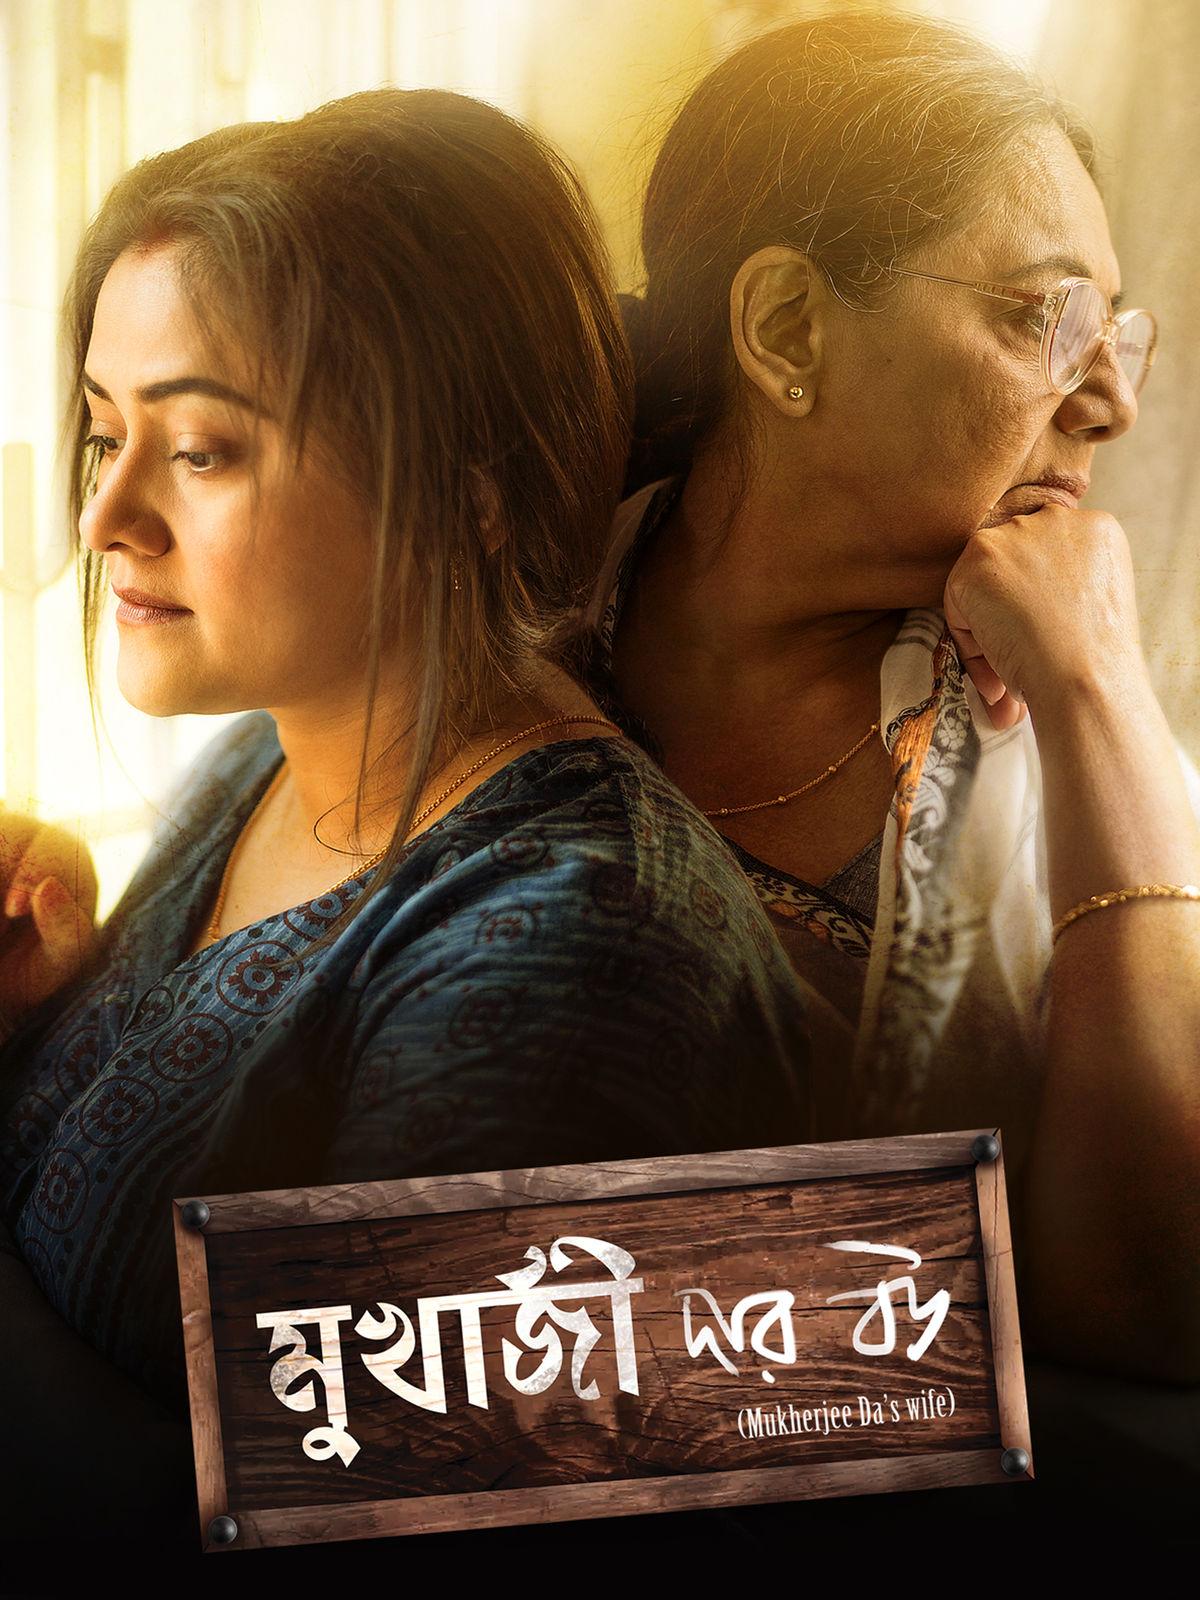 Anusuya Majumdar Best Movies, TV Shows and Web Series List